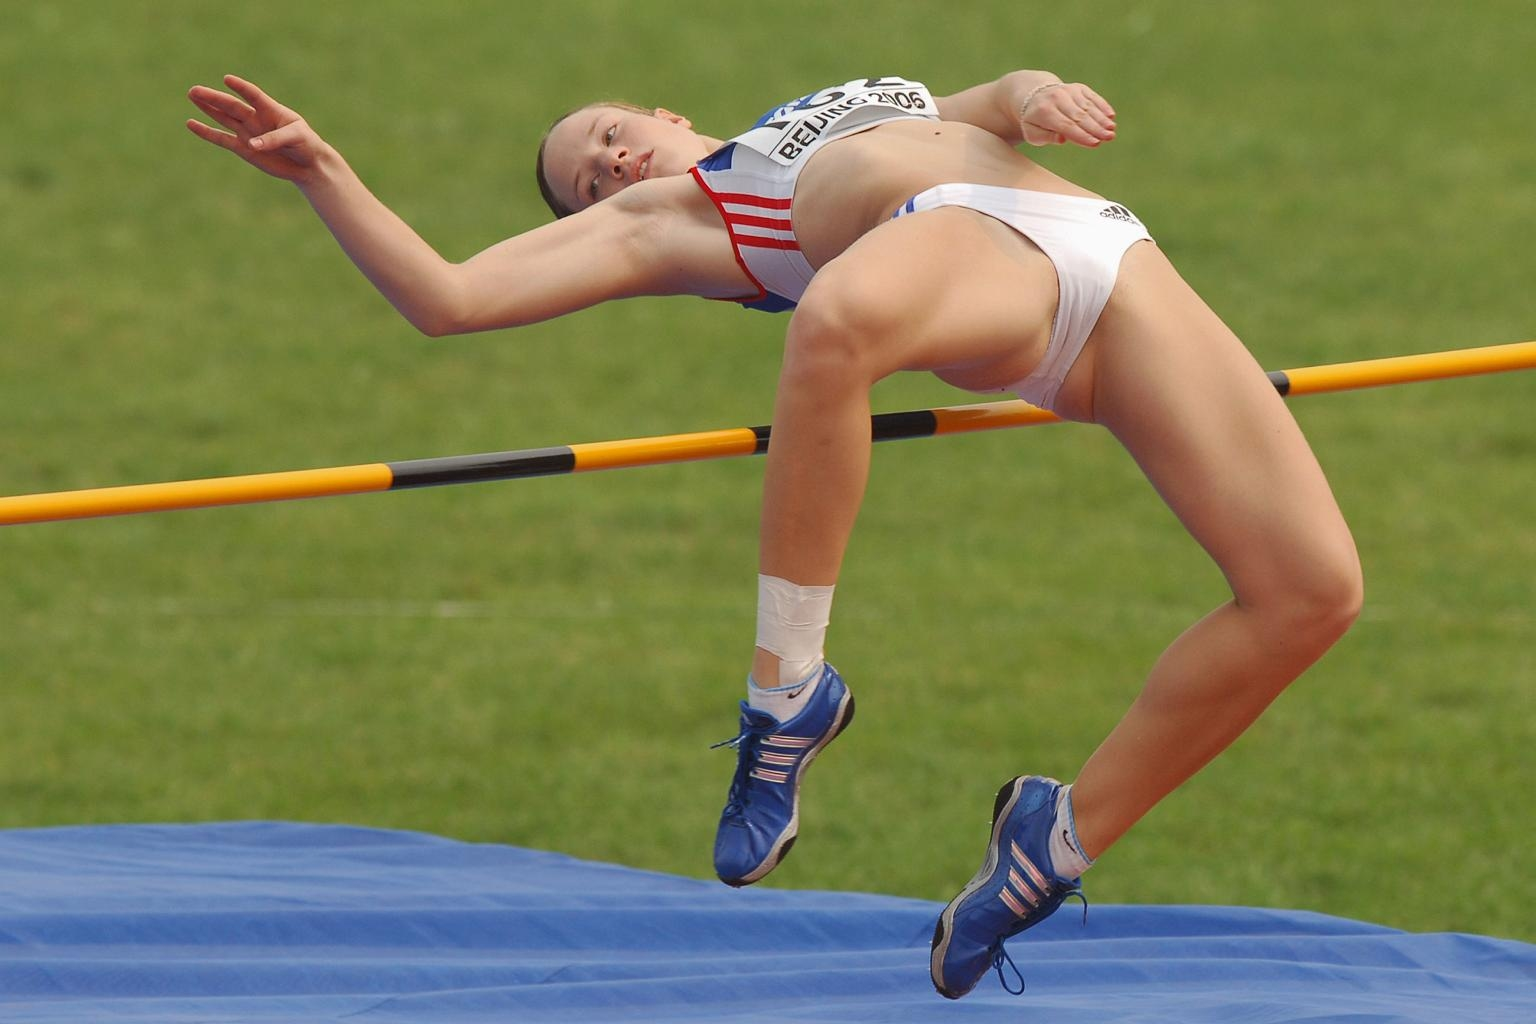 Спортсменка порвала костюм на жопе фото 19 фотография